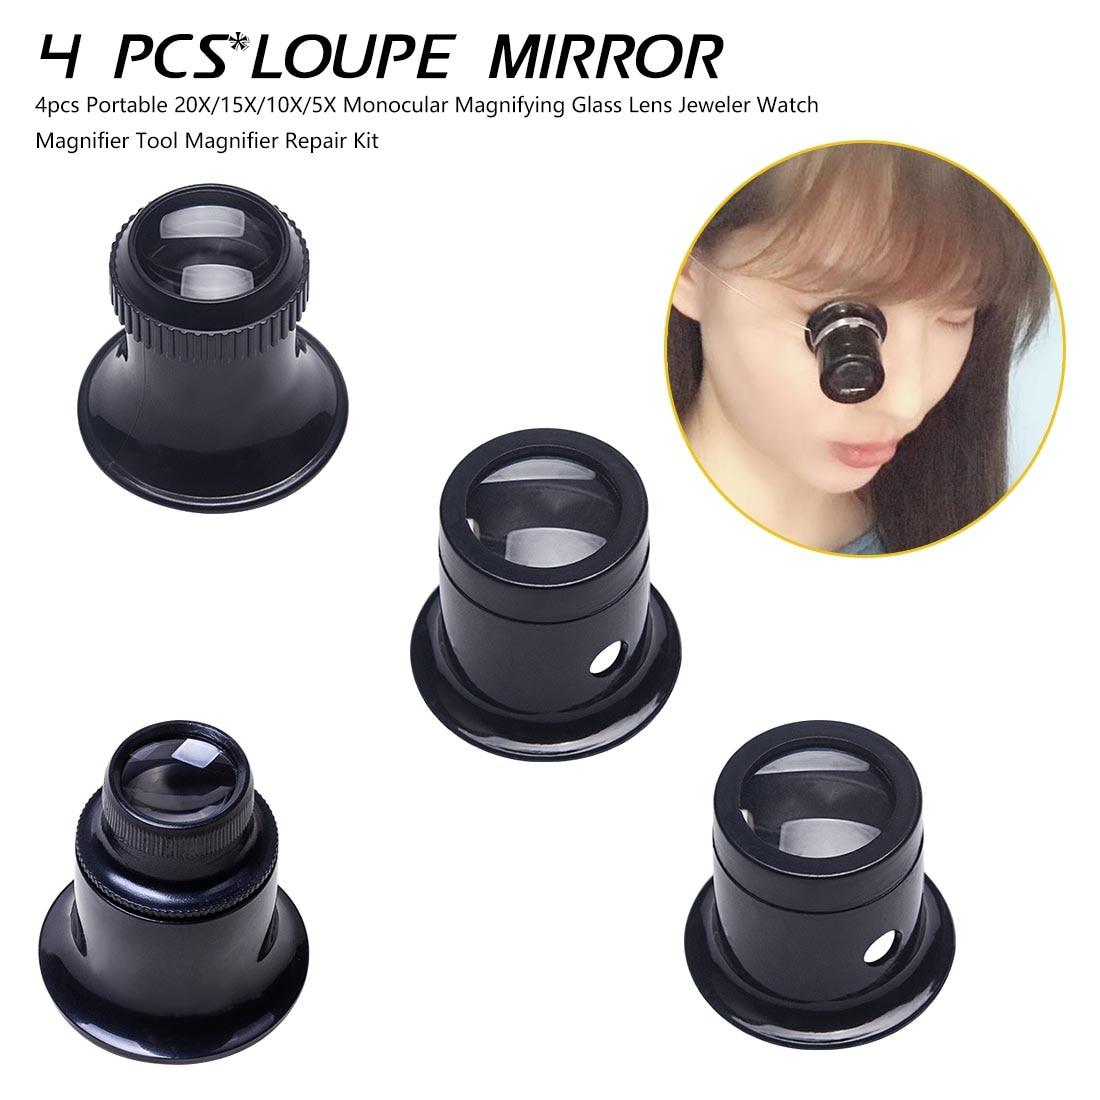 4pcs Portable 20X/15X/10X/5X Monocular Magnifying Glass Lens Jeweler Watch Magnifier Tool Magnifier Repair Kit